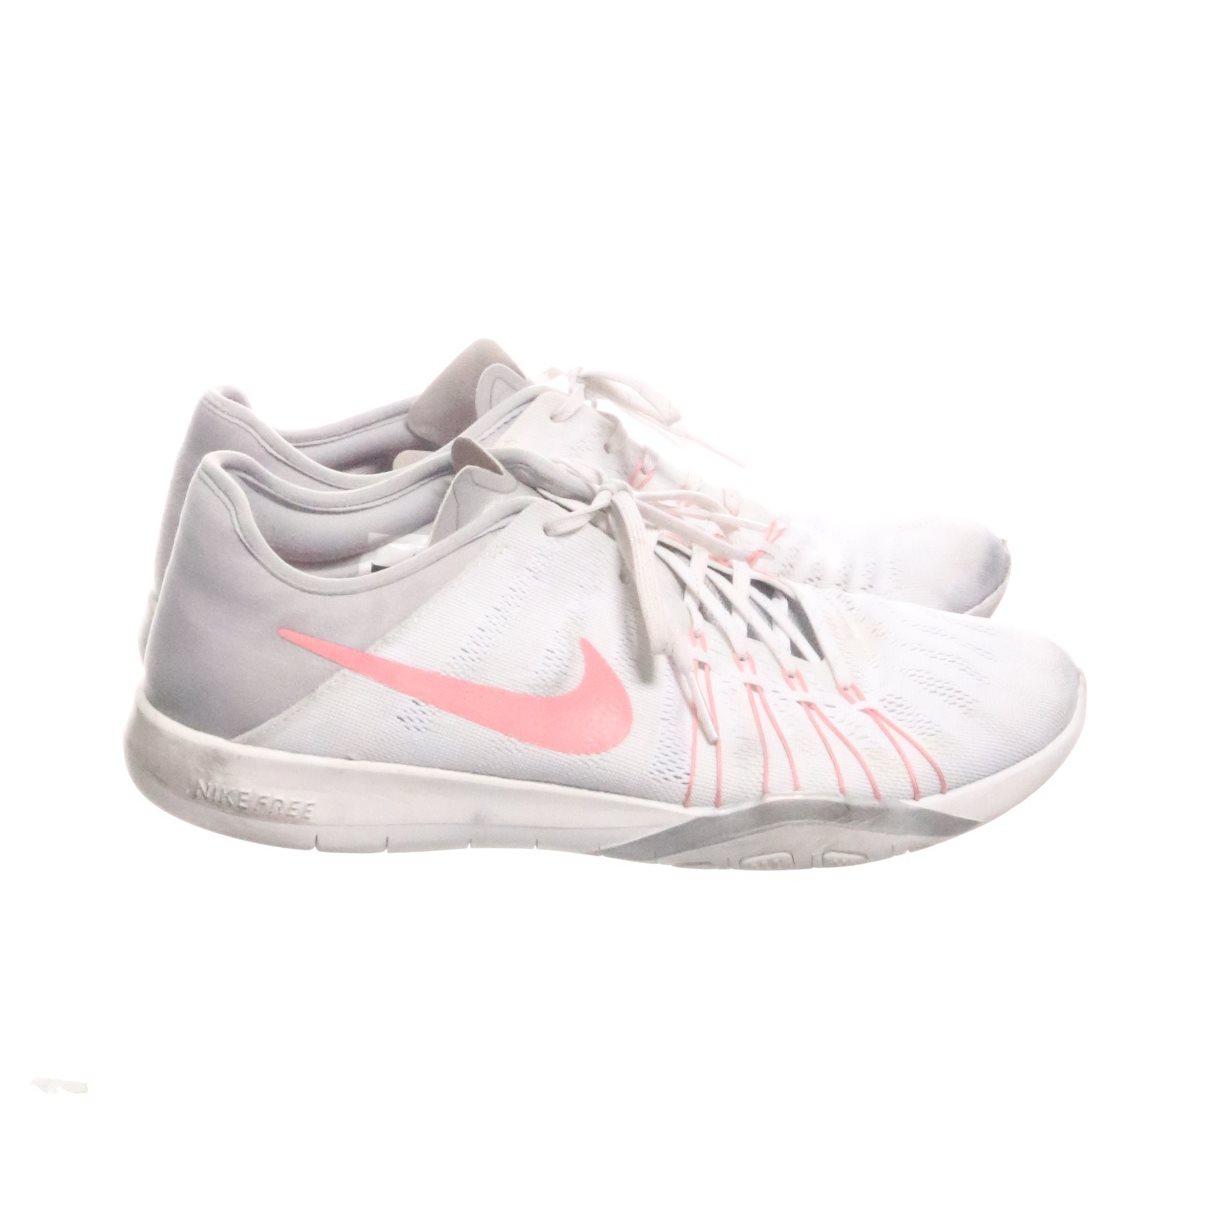 size 40 e6ff1 97e8a ... Dam  separation shoes 99476 662d7 Nike, Träningsskor, Strl 40, Free,  GråRosaVit